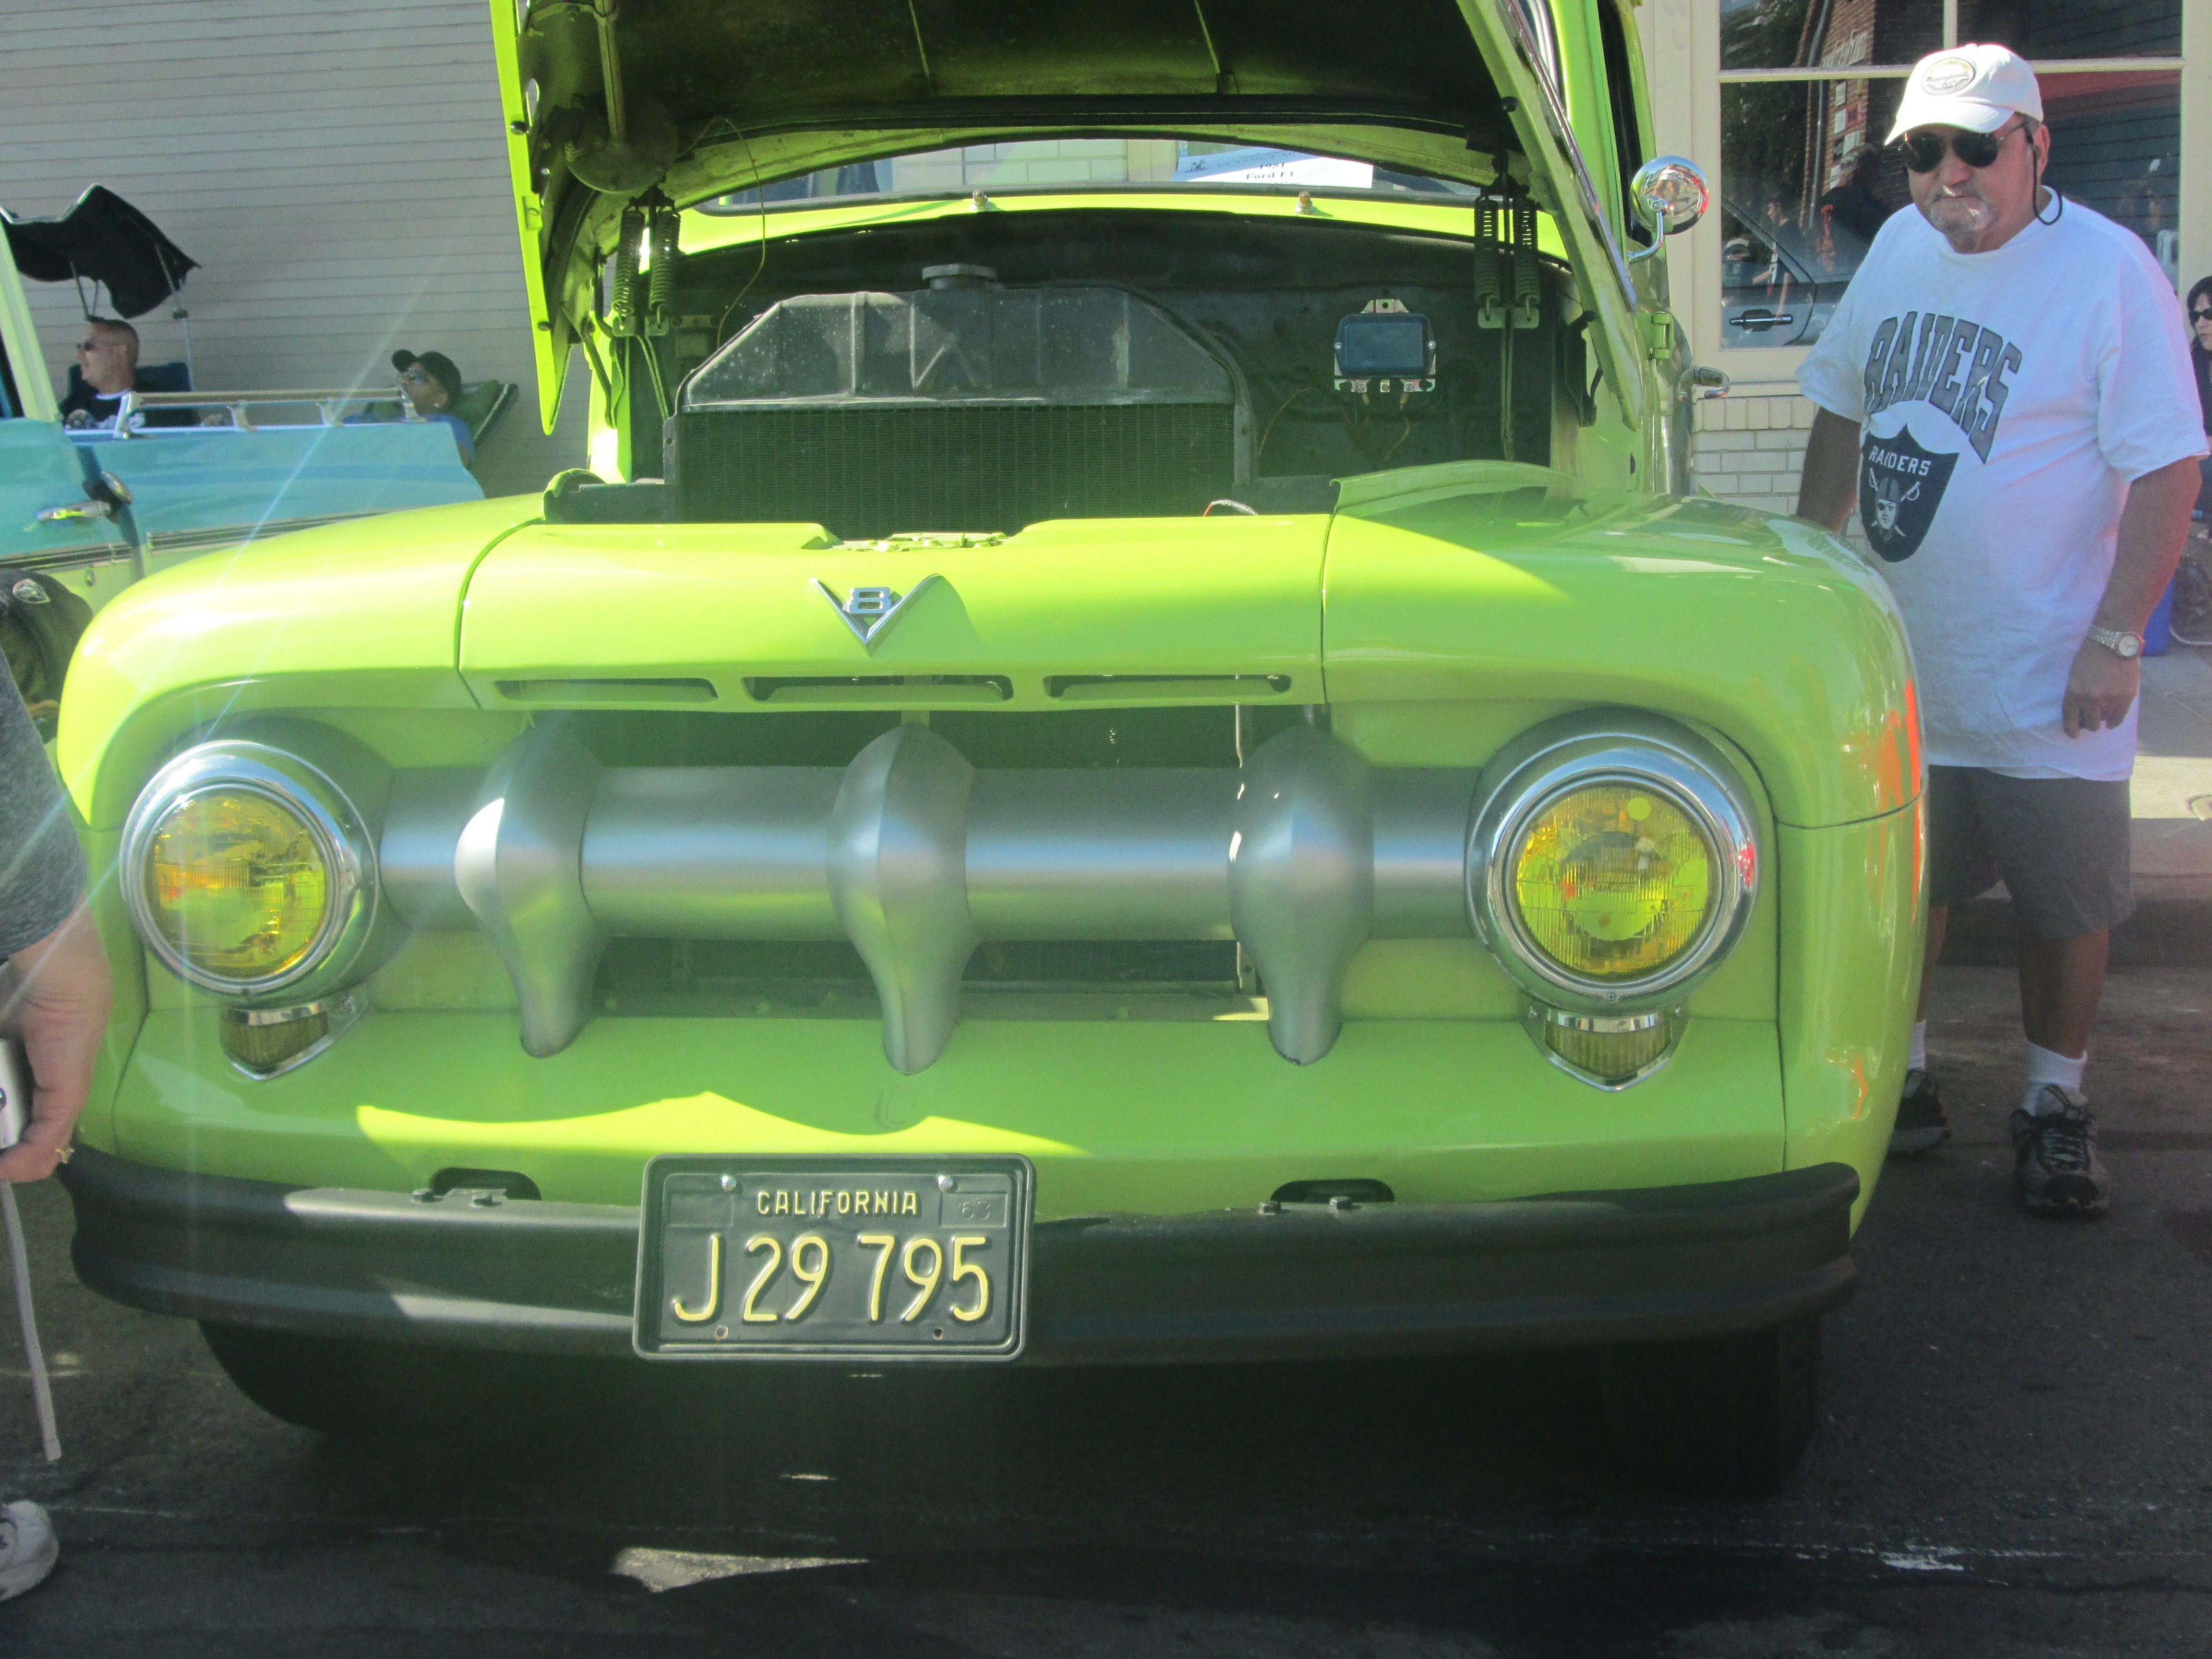 Neon green car.